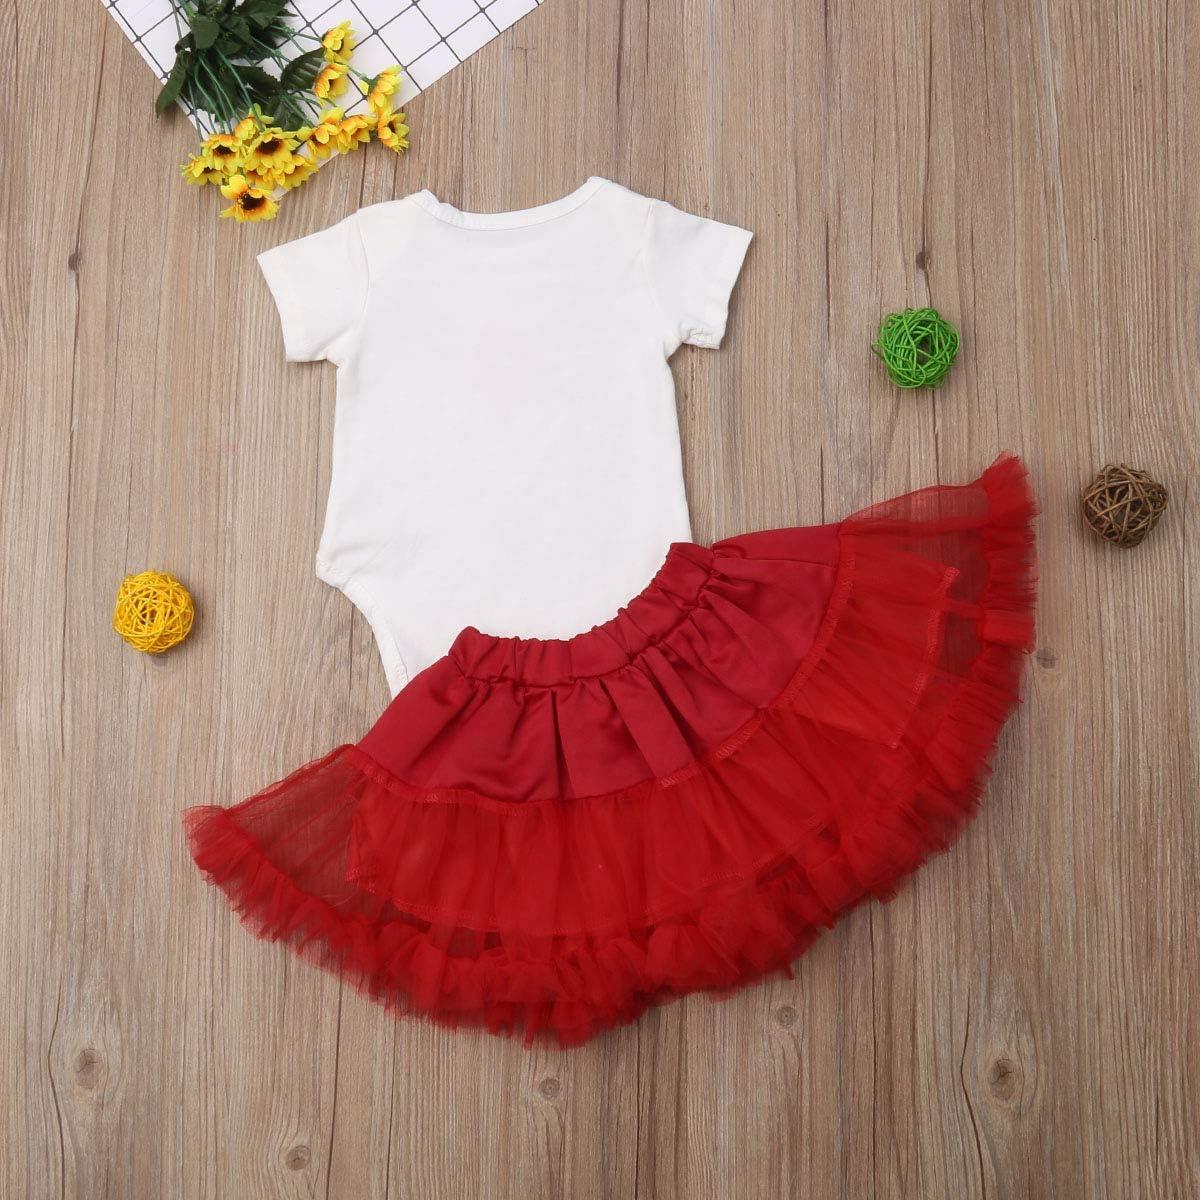 Newborn Baby Girls Christmas Outfits Short Sleeve Romper Tutu Skirt Dress up Clothes Set